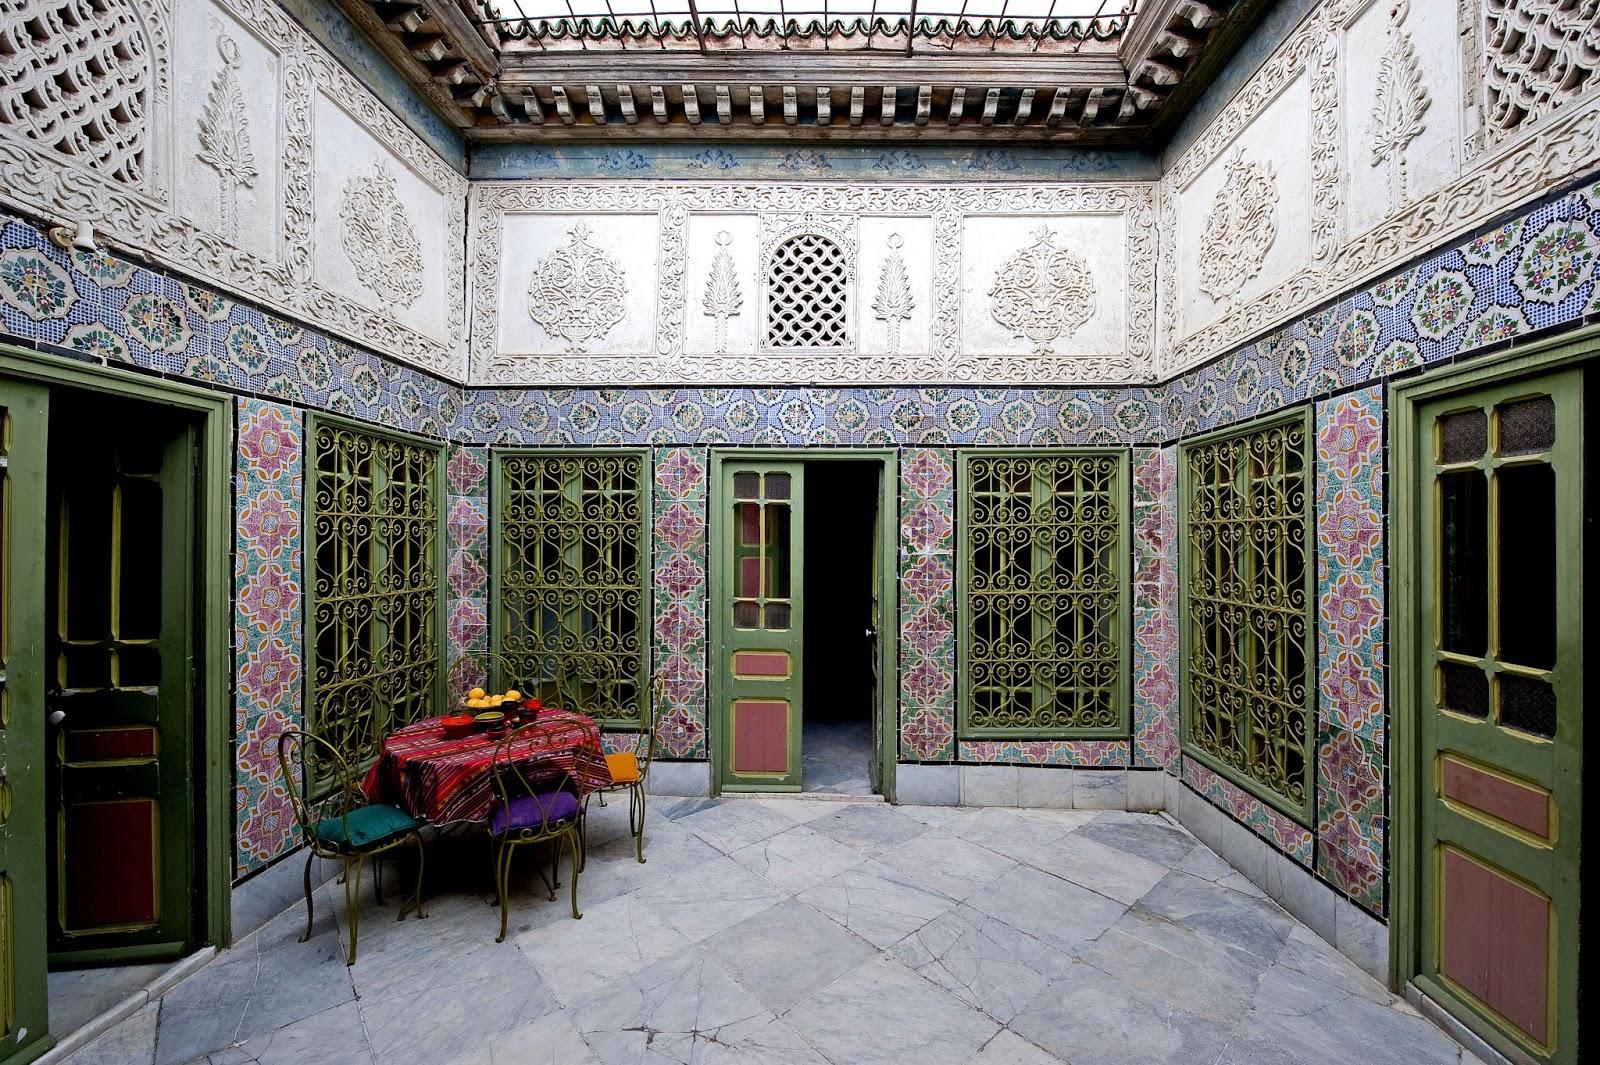 Chambres d 39 h tes la chambre bleue tunis tunisie voyage for Chambre bleue tunis